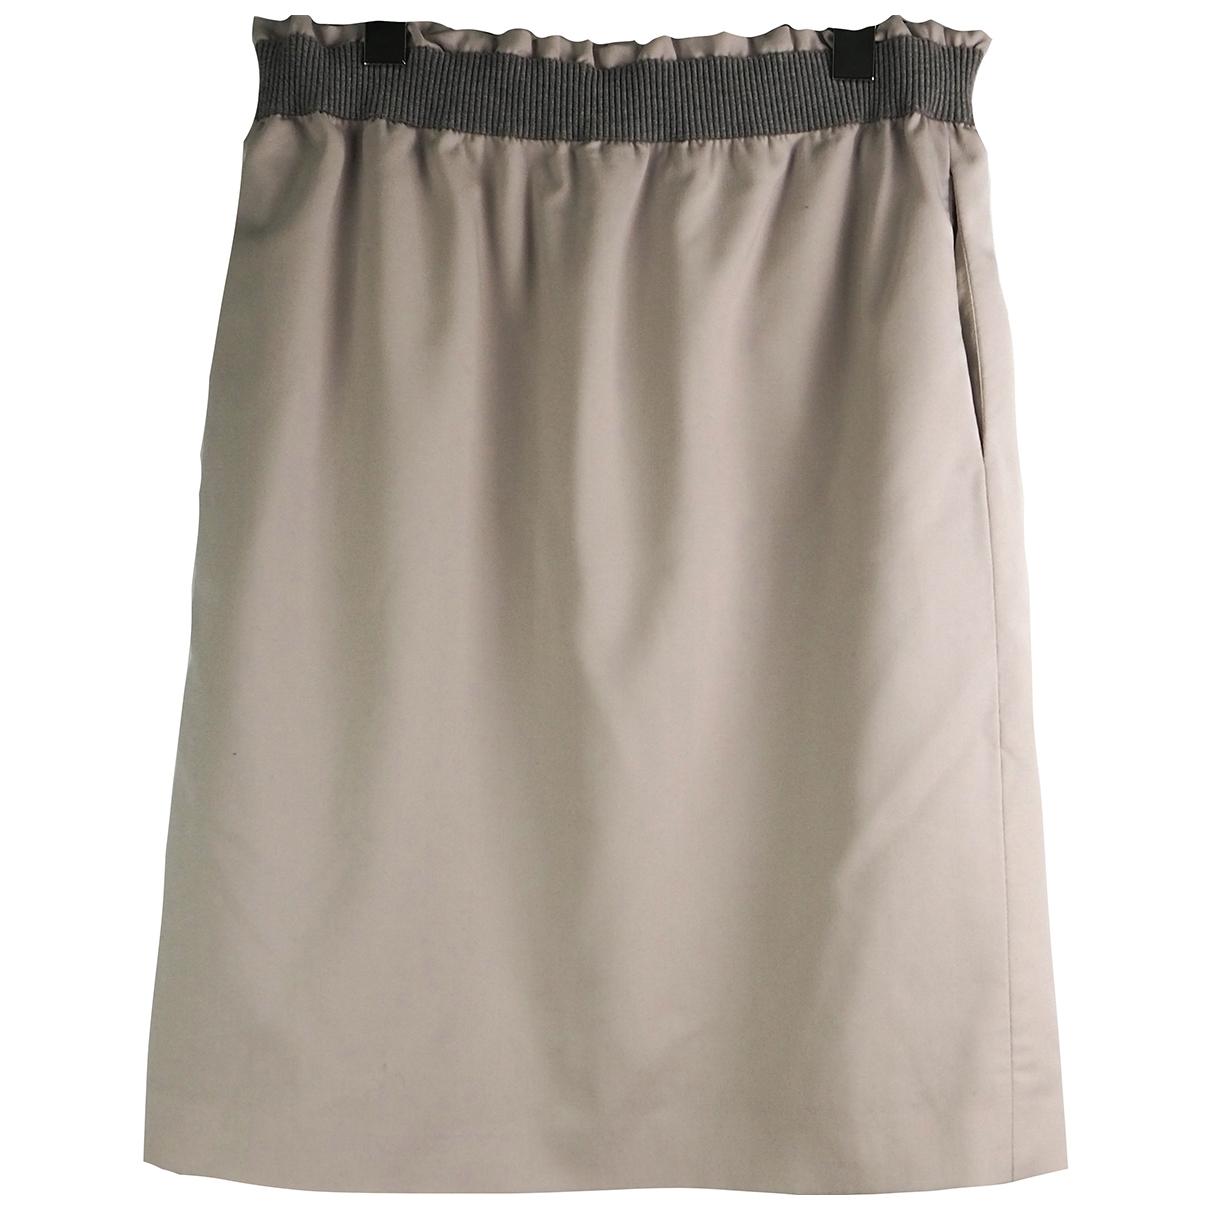 Fabiana Filippi \N Grey Wool skirt for Women 44 IT